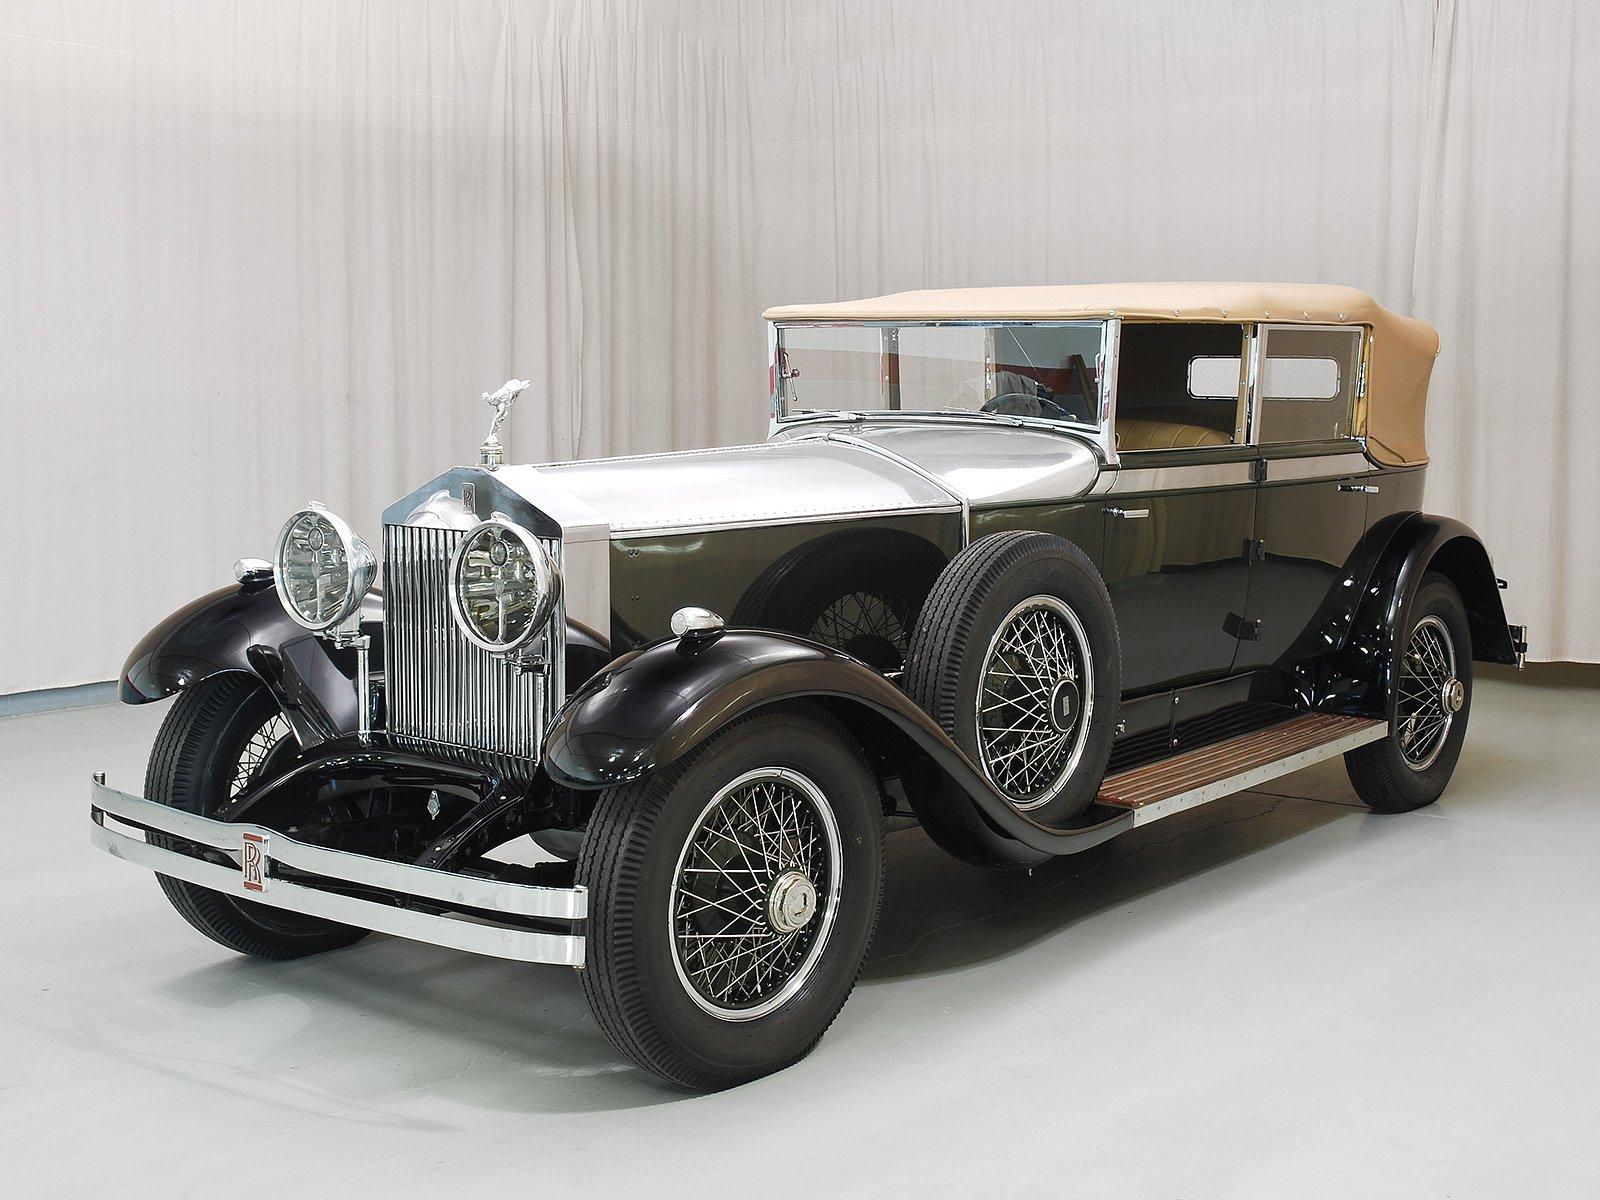 1929 RollsRoyce Phantom I Newmarket Convertible Sedan